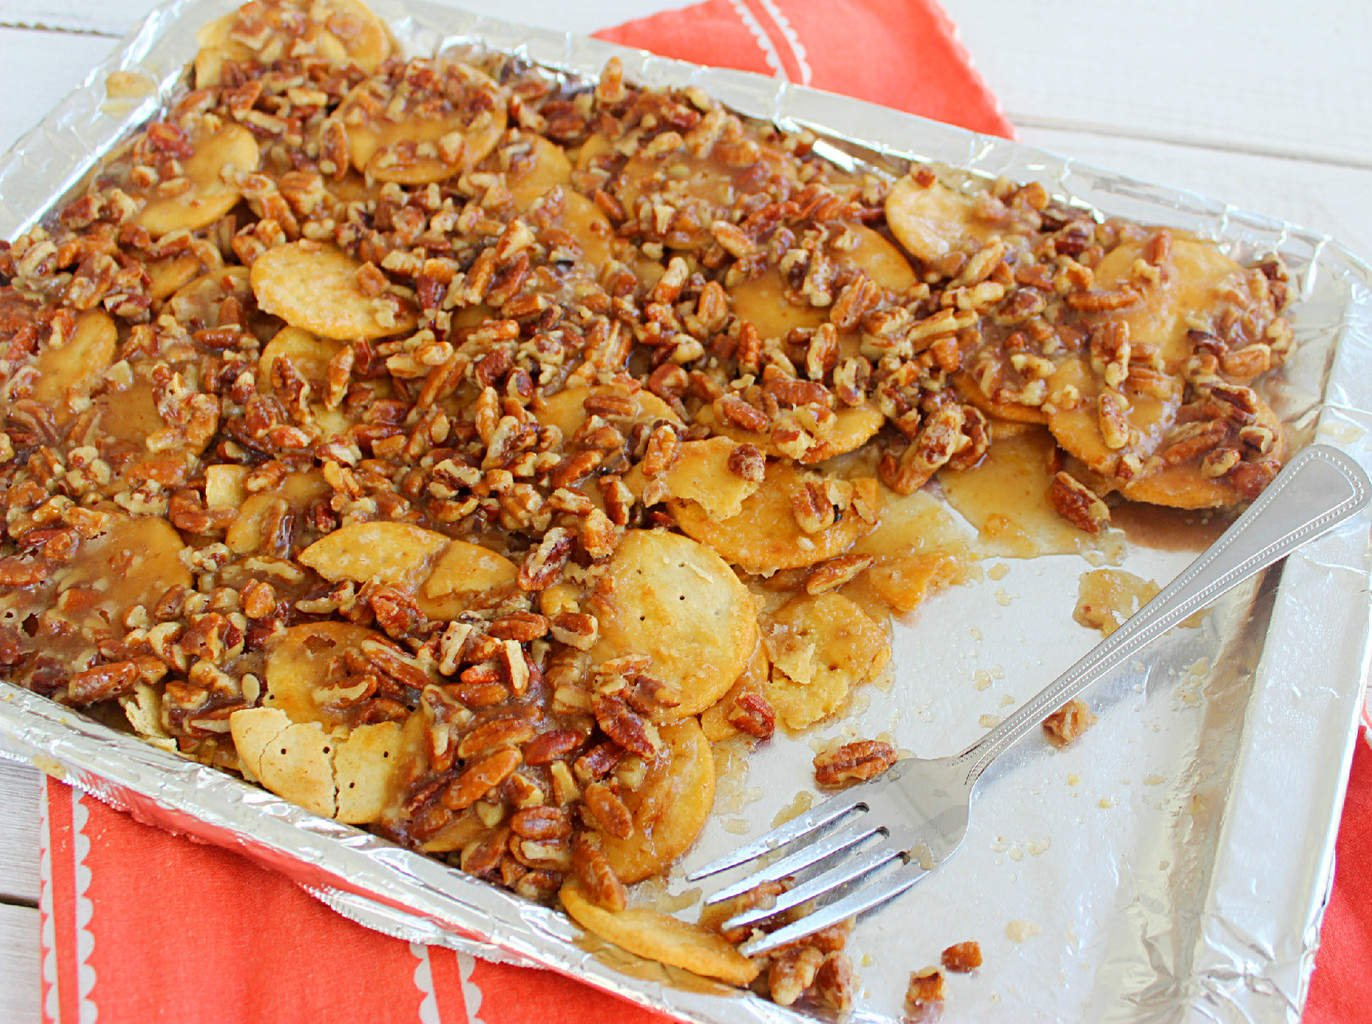 Pecan Pie Nachos- a pecan pie-like filling over round crackers